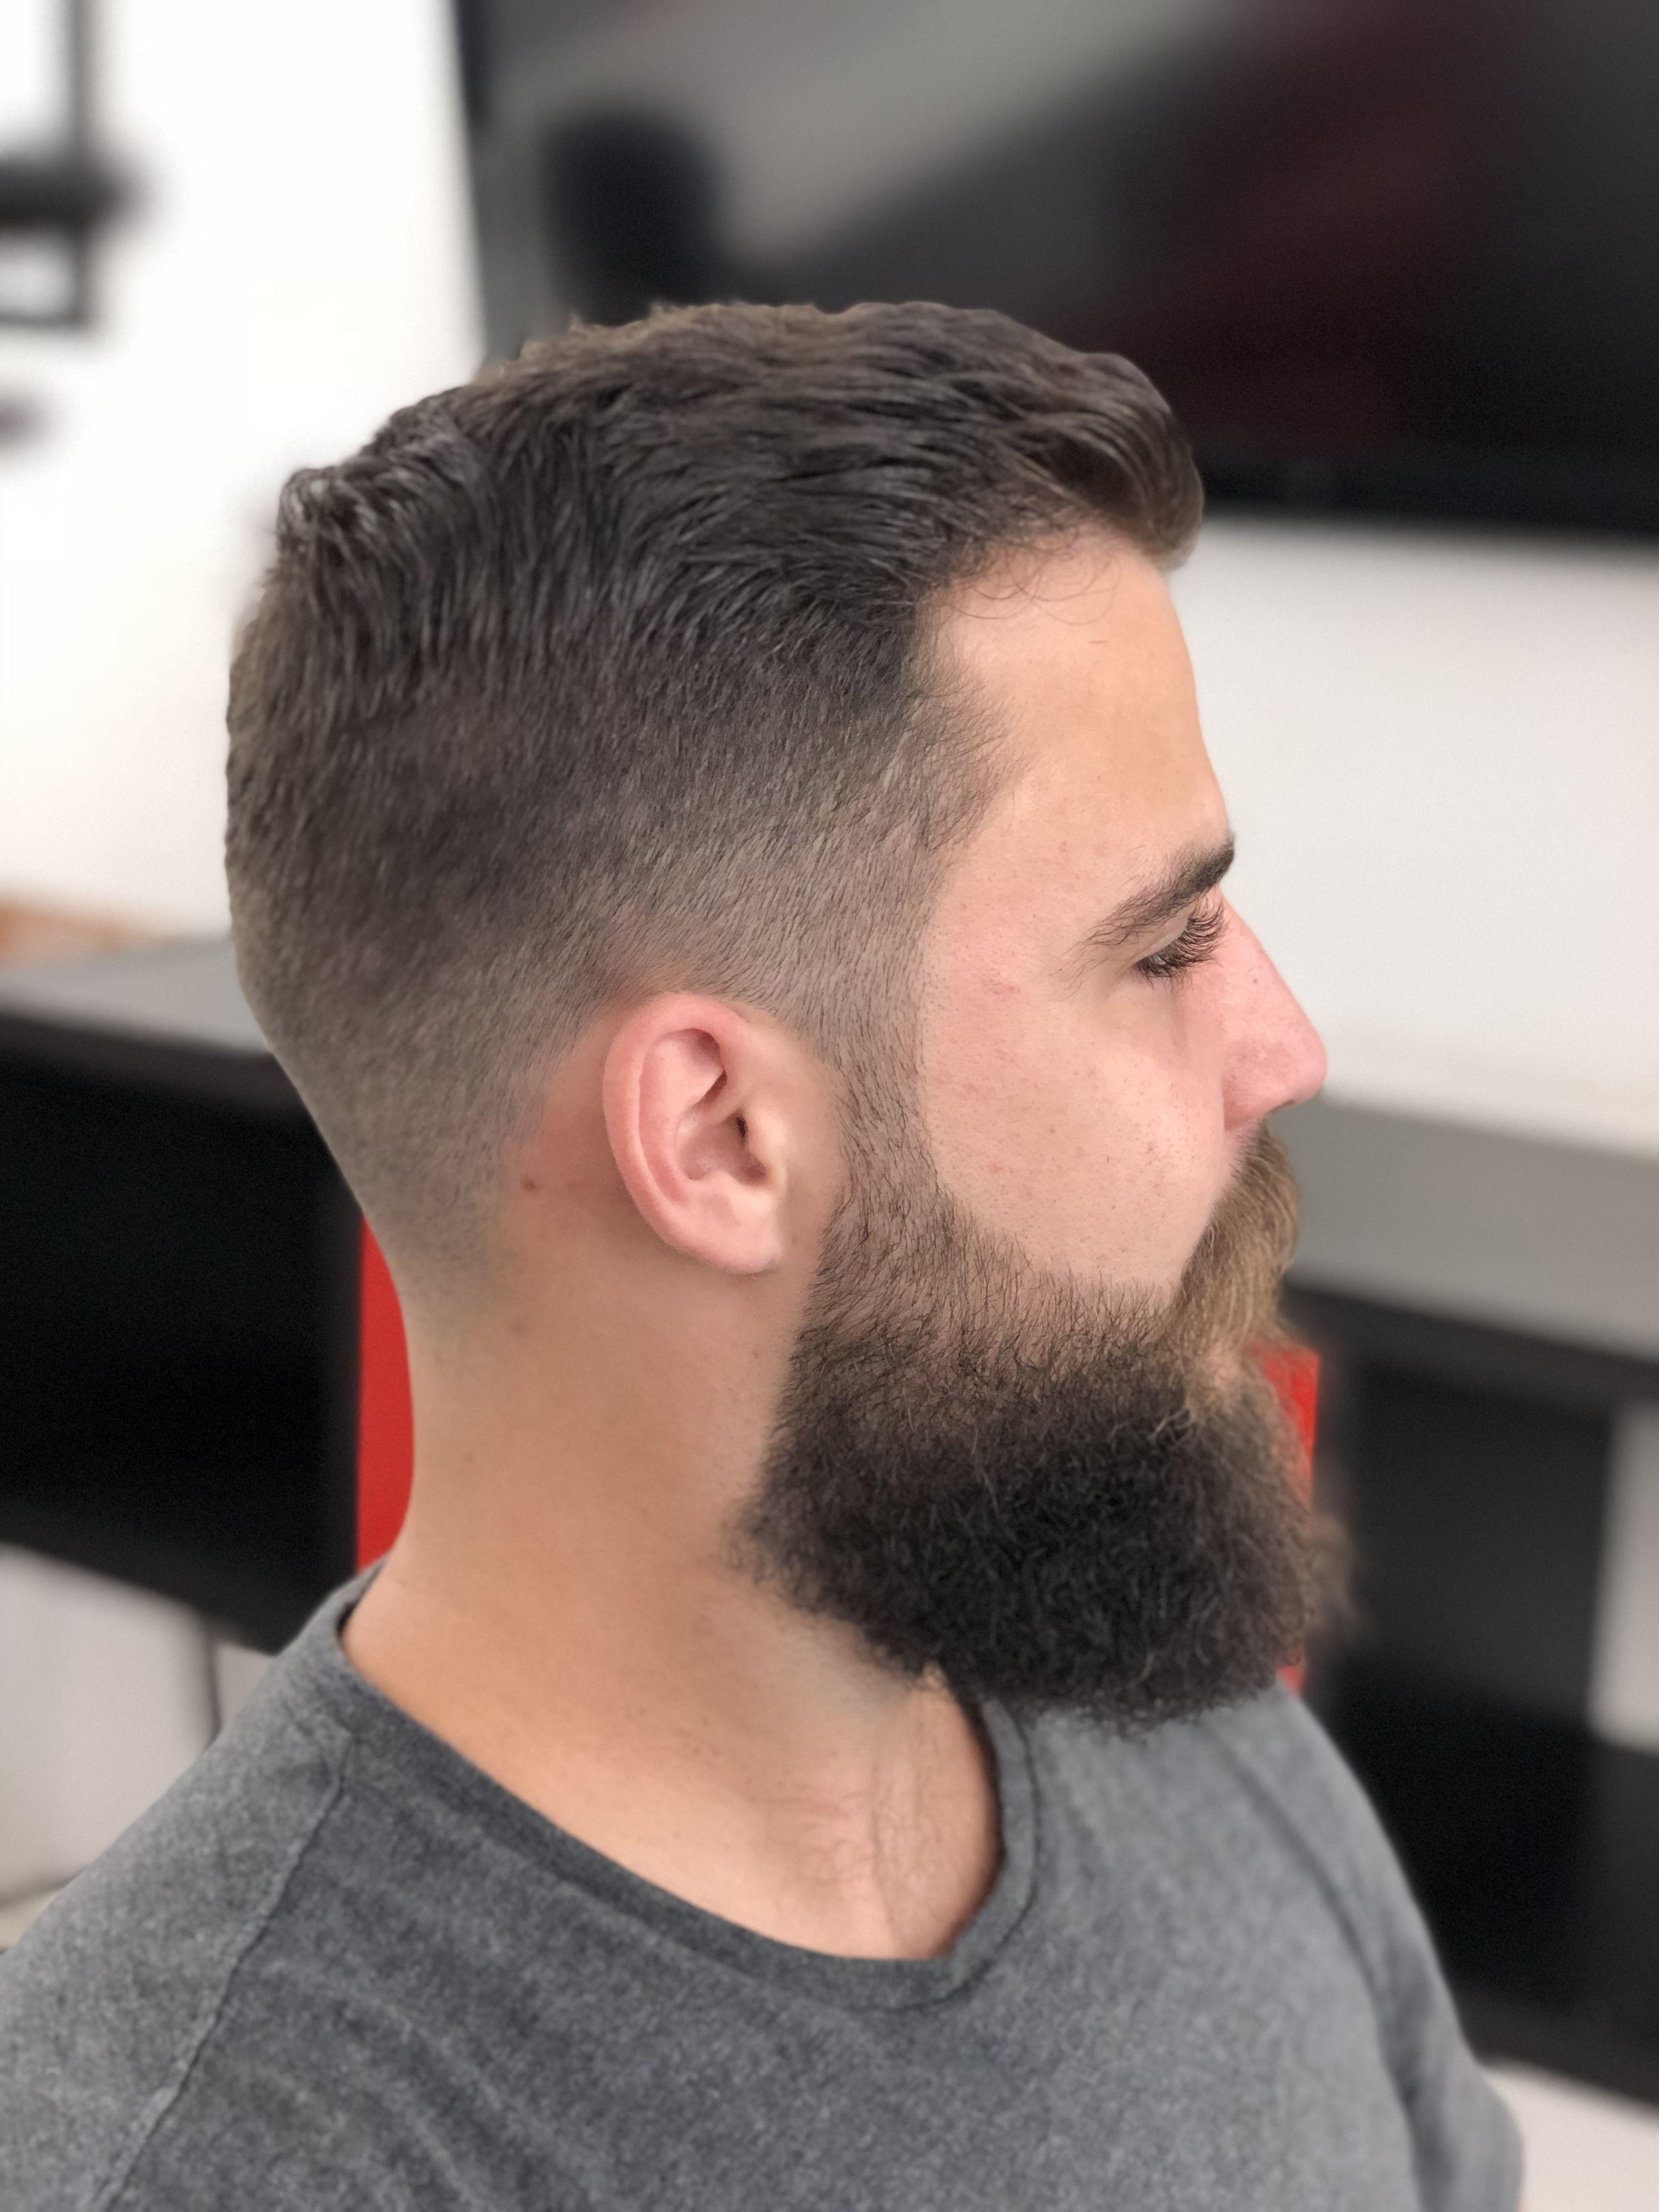 Possible Hairstyles Dapperhaircuts Mens Haircuts Short Hair And Beard Styles Short Hair Long Beard